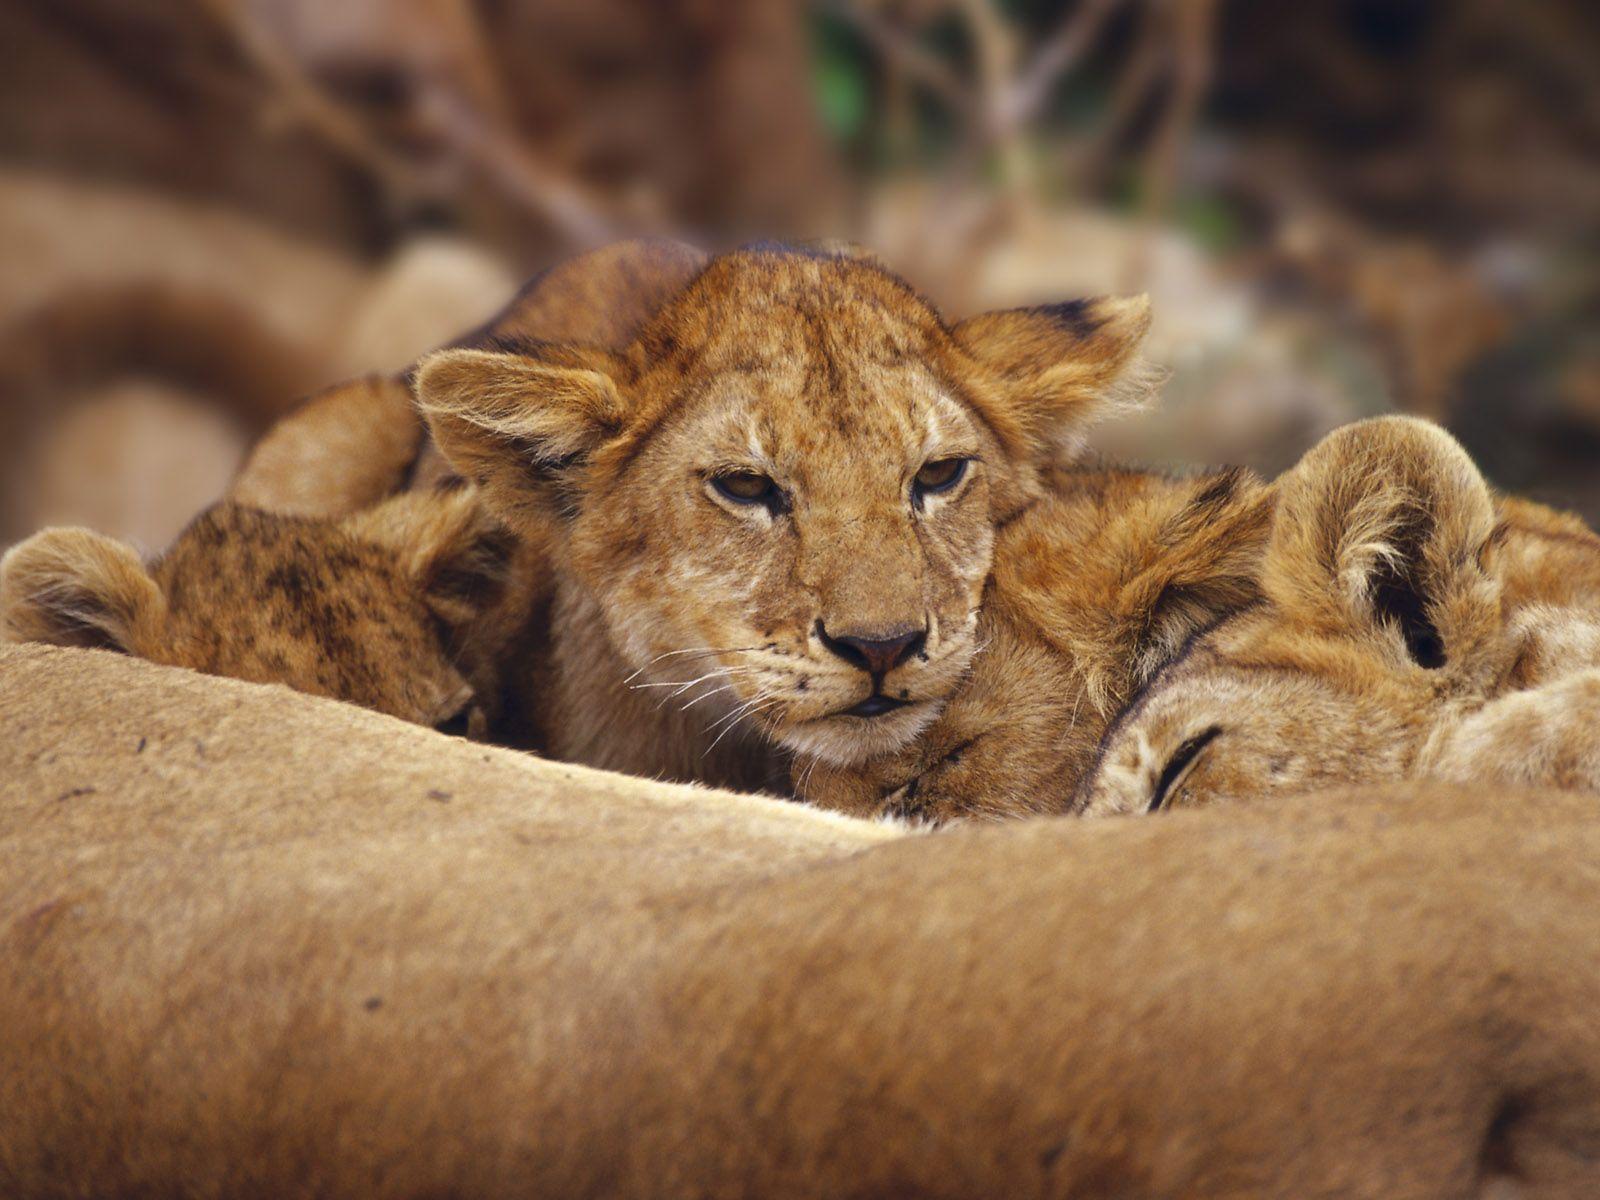 Lion Wallpapers | 3D Wallpaper | Nature Wallpaper | Free Download ...